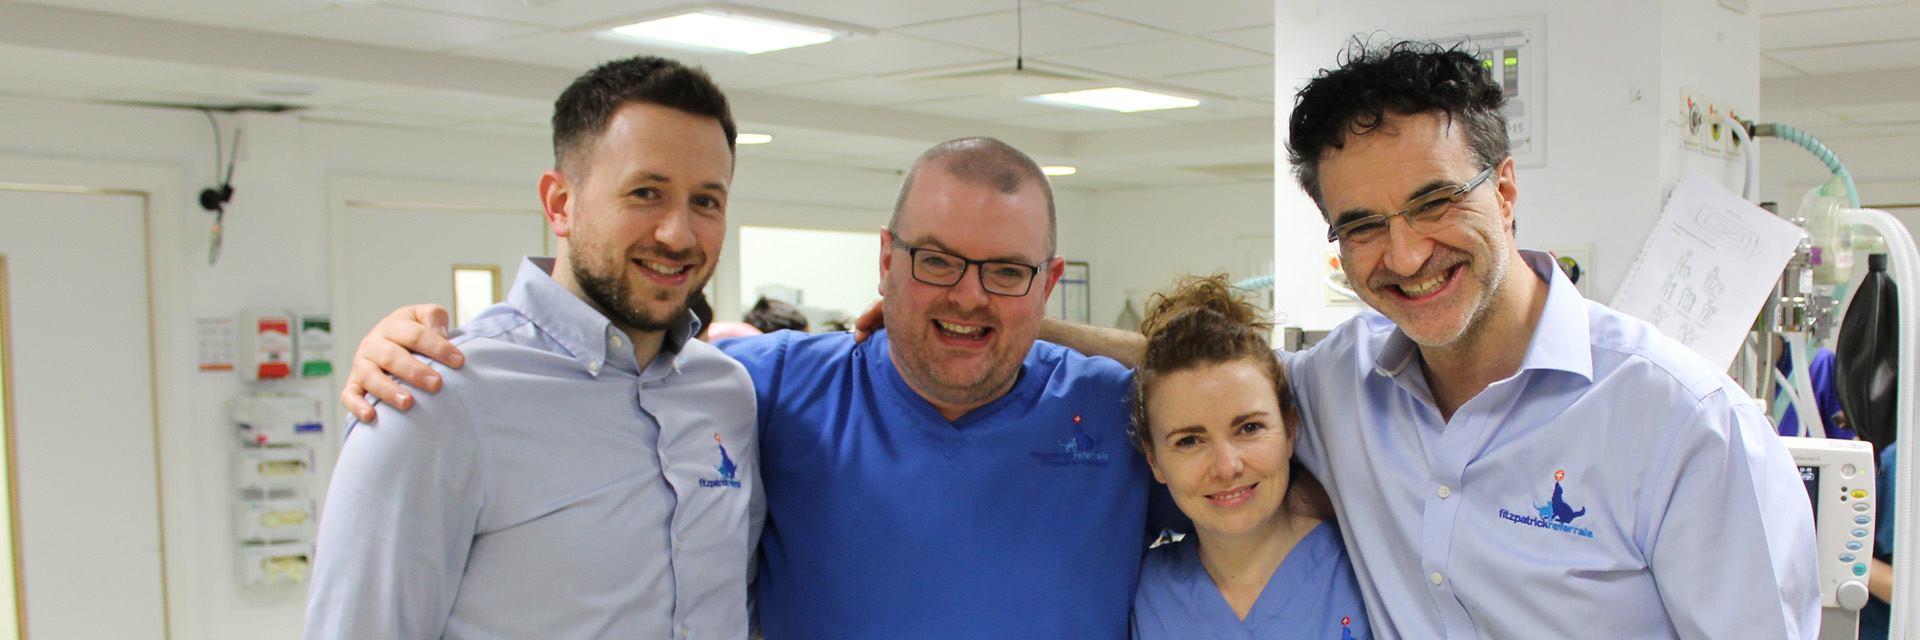 Orthopaedic surgeons James, Padraig and Susan with Professor Noel Fitzpatrick